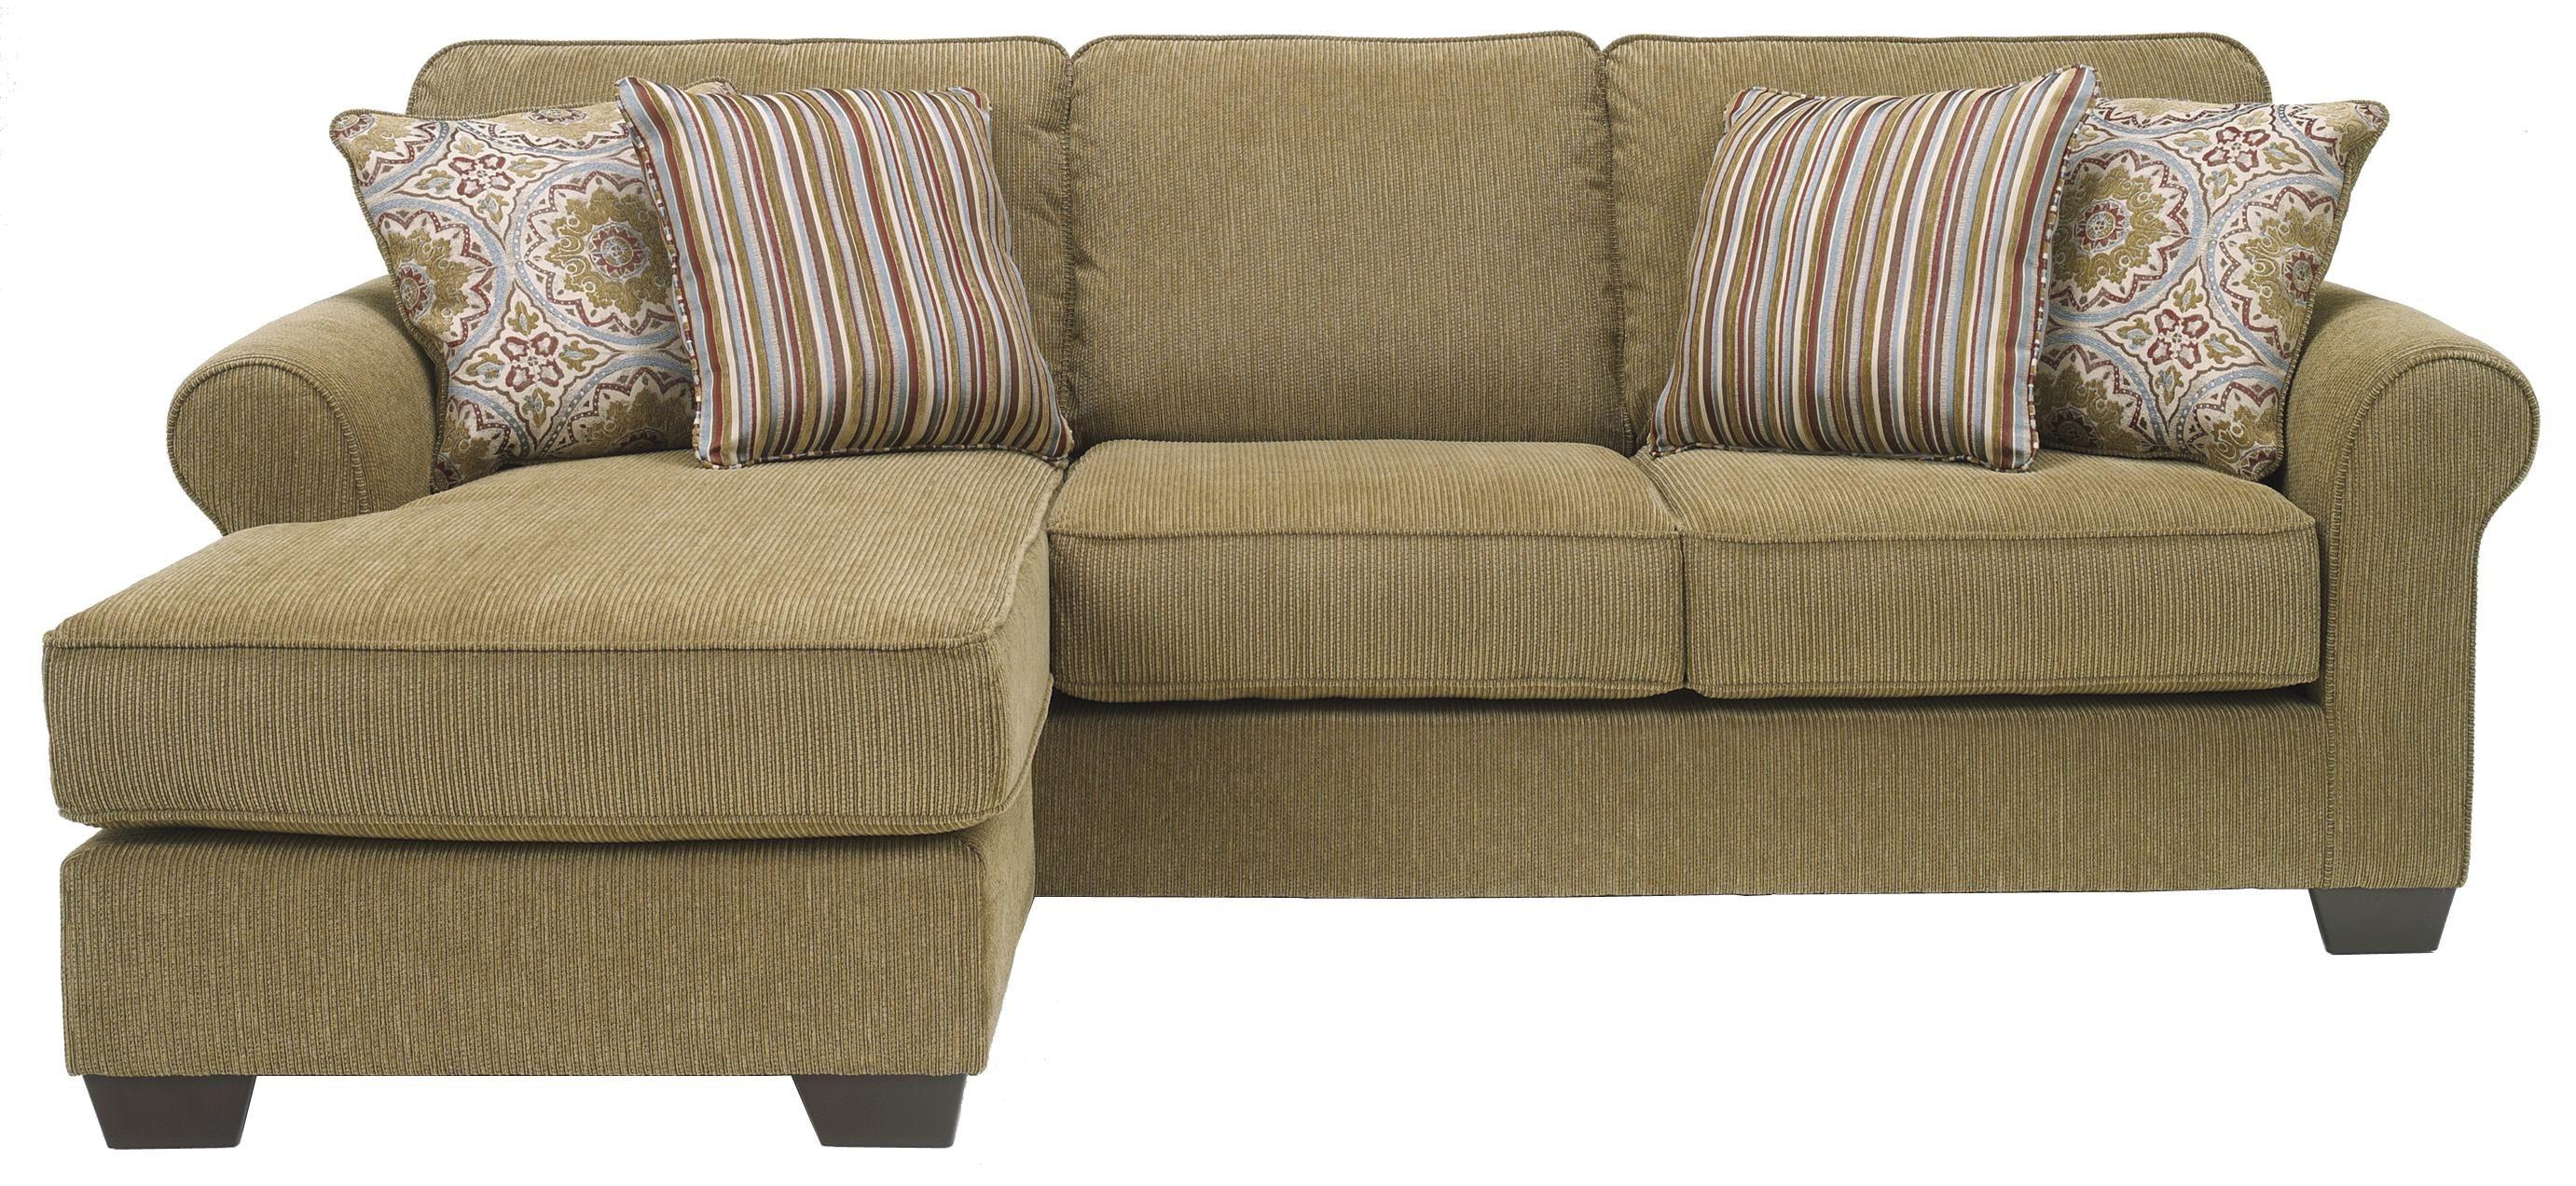 Corridon   Burlap Sofa Chaise By Benchcraft By Ashley